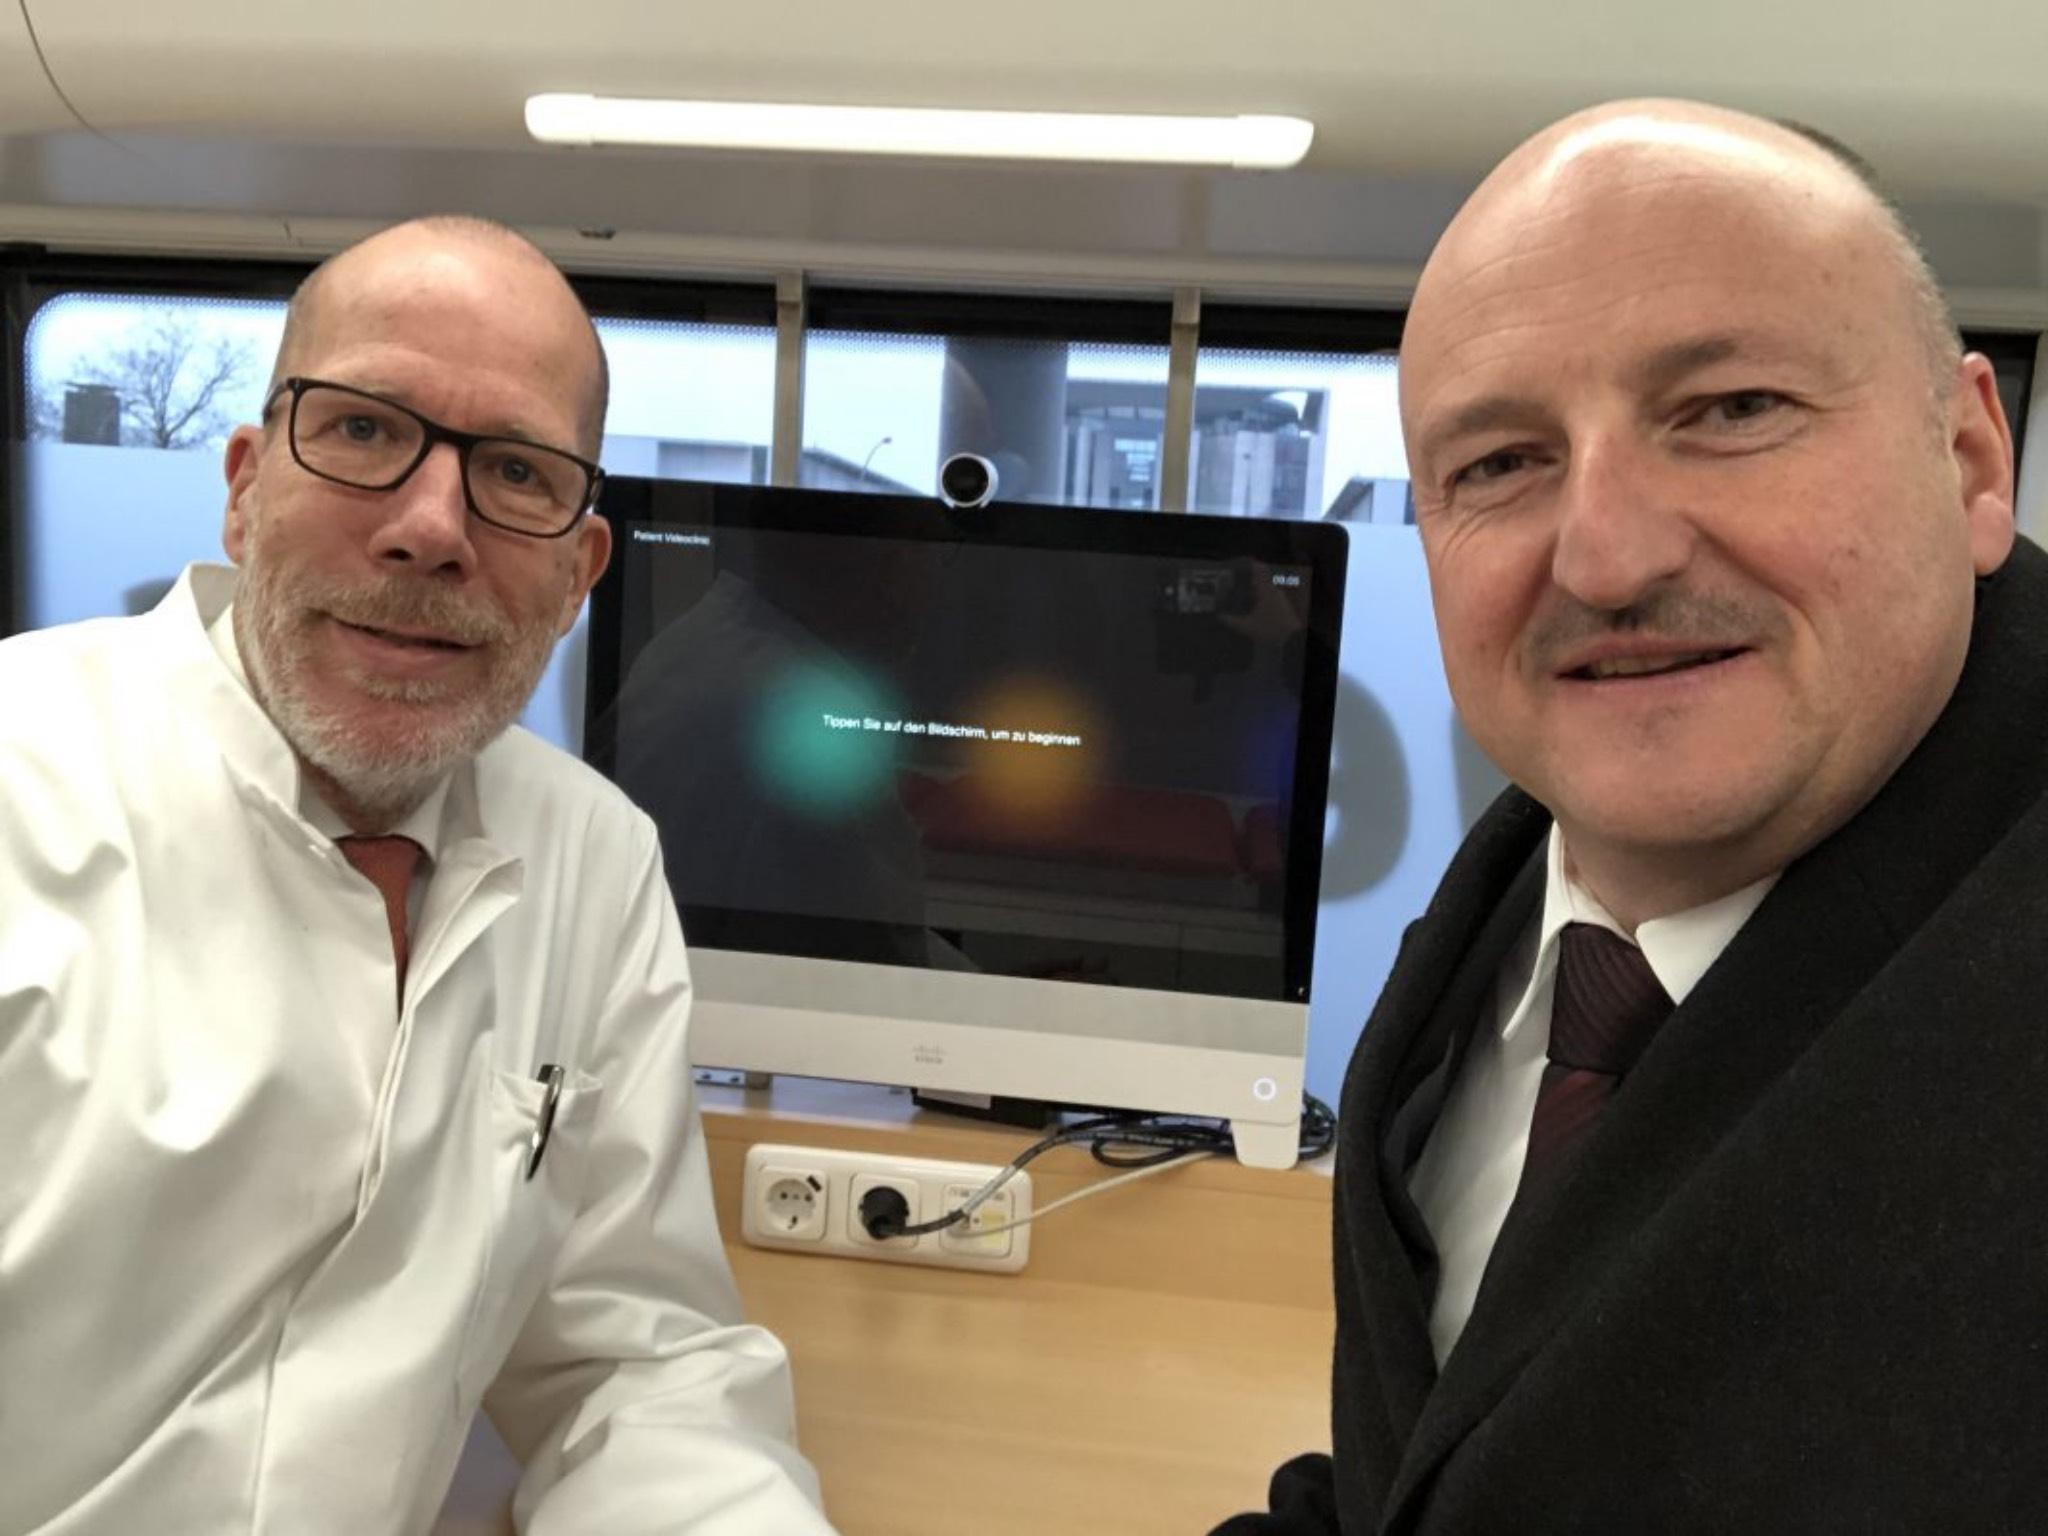 Im DB-Medibus: Bernd Rützel mit dem Leitenden Arzt Dr. Christian Gravert ; Foto: Brigitte Sorg